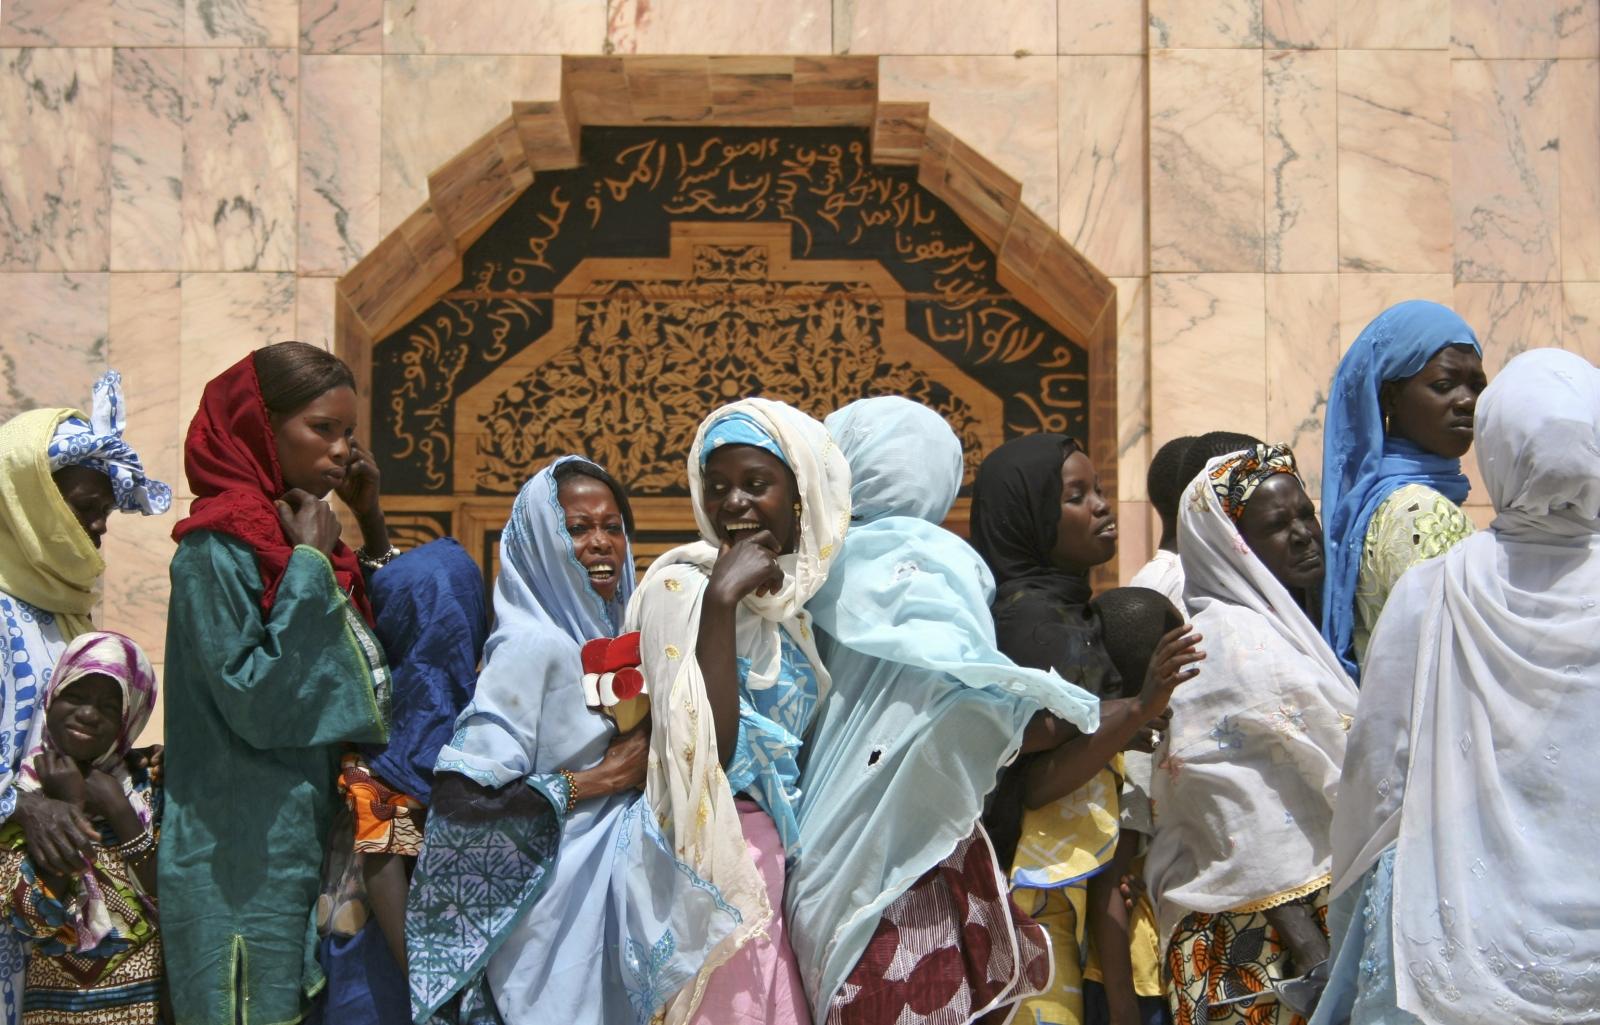 Touba's Grand Magal pilgrimage